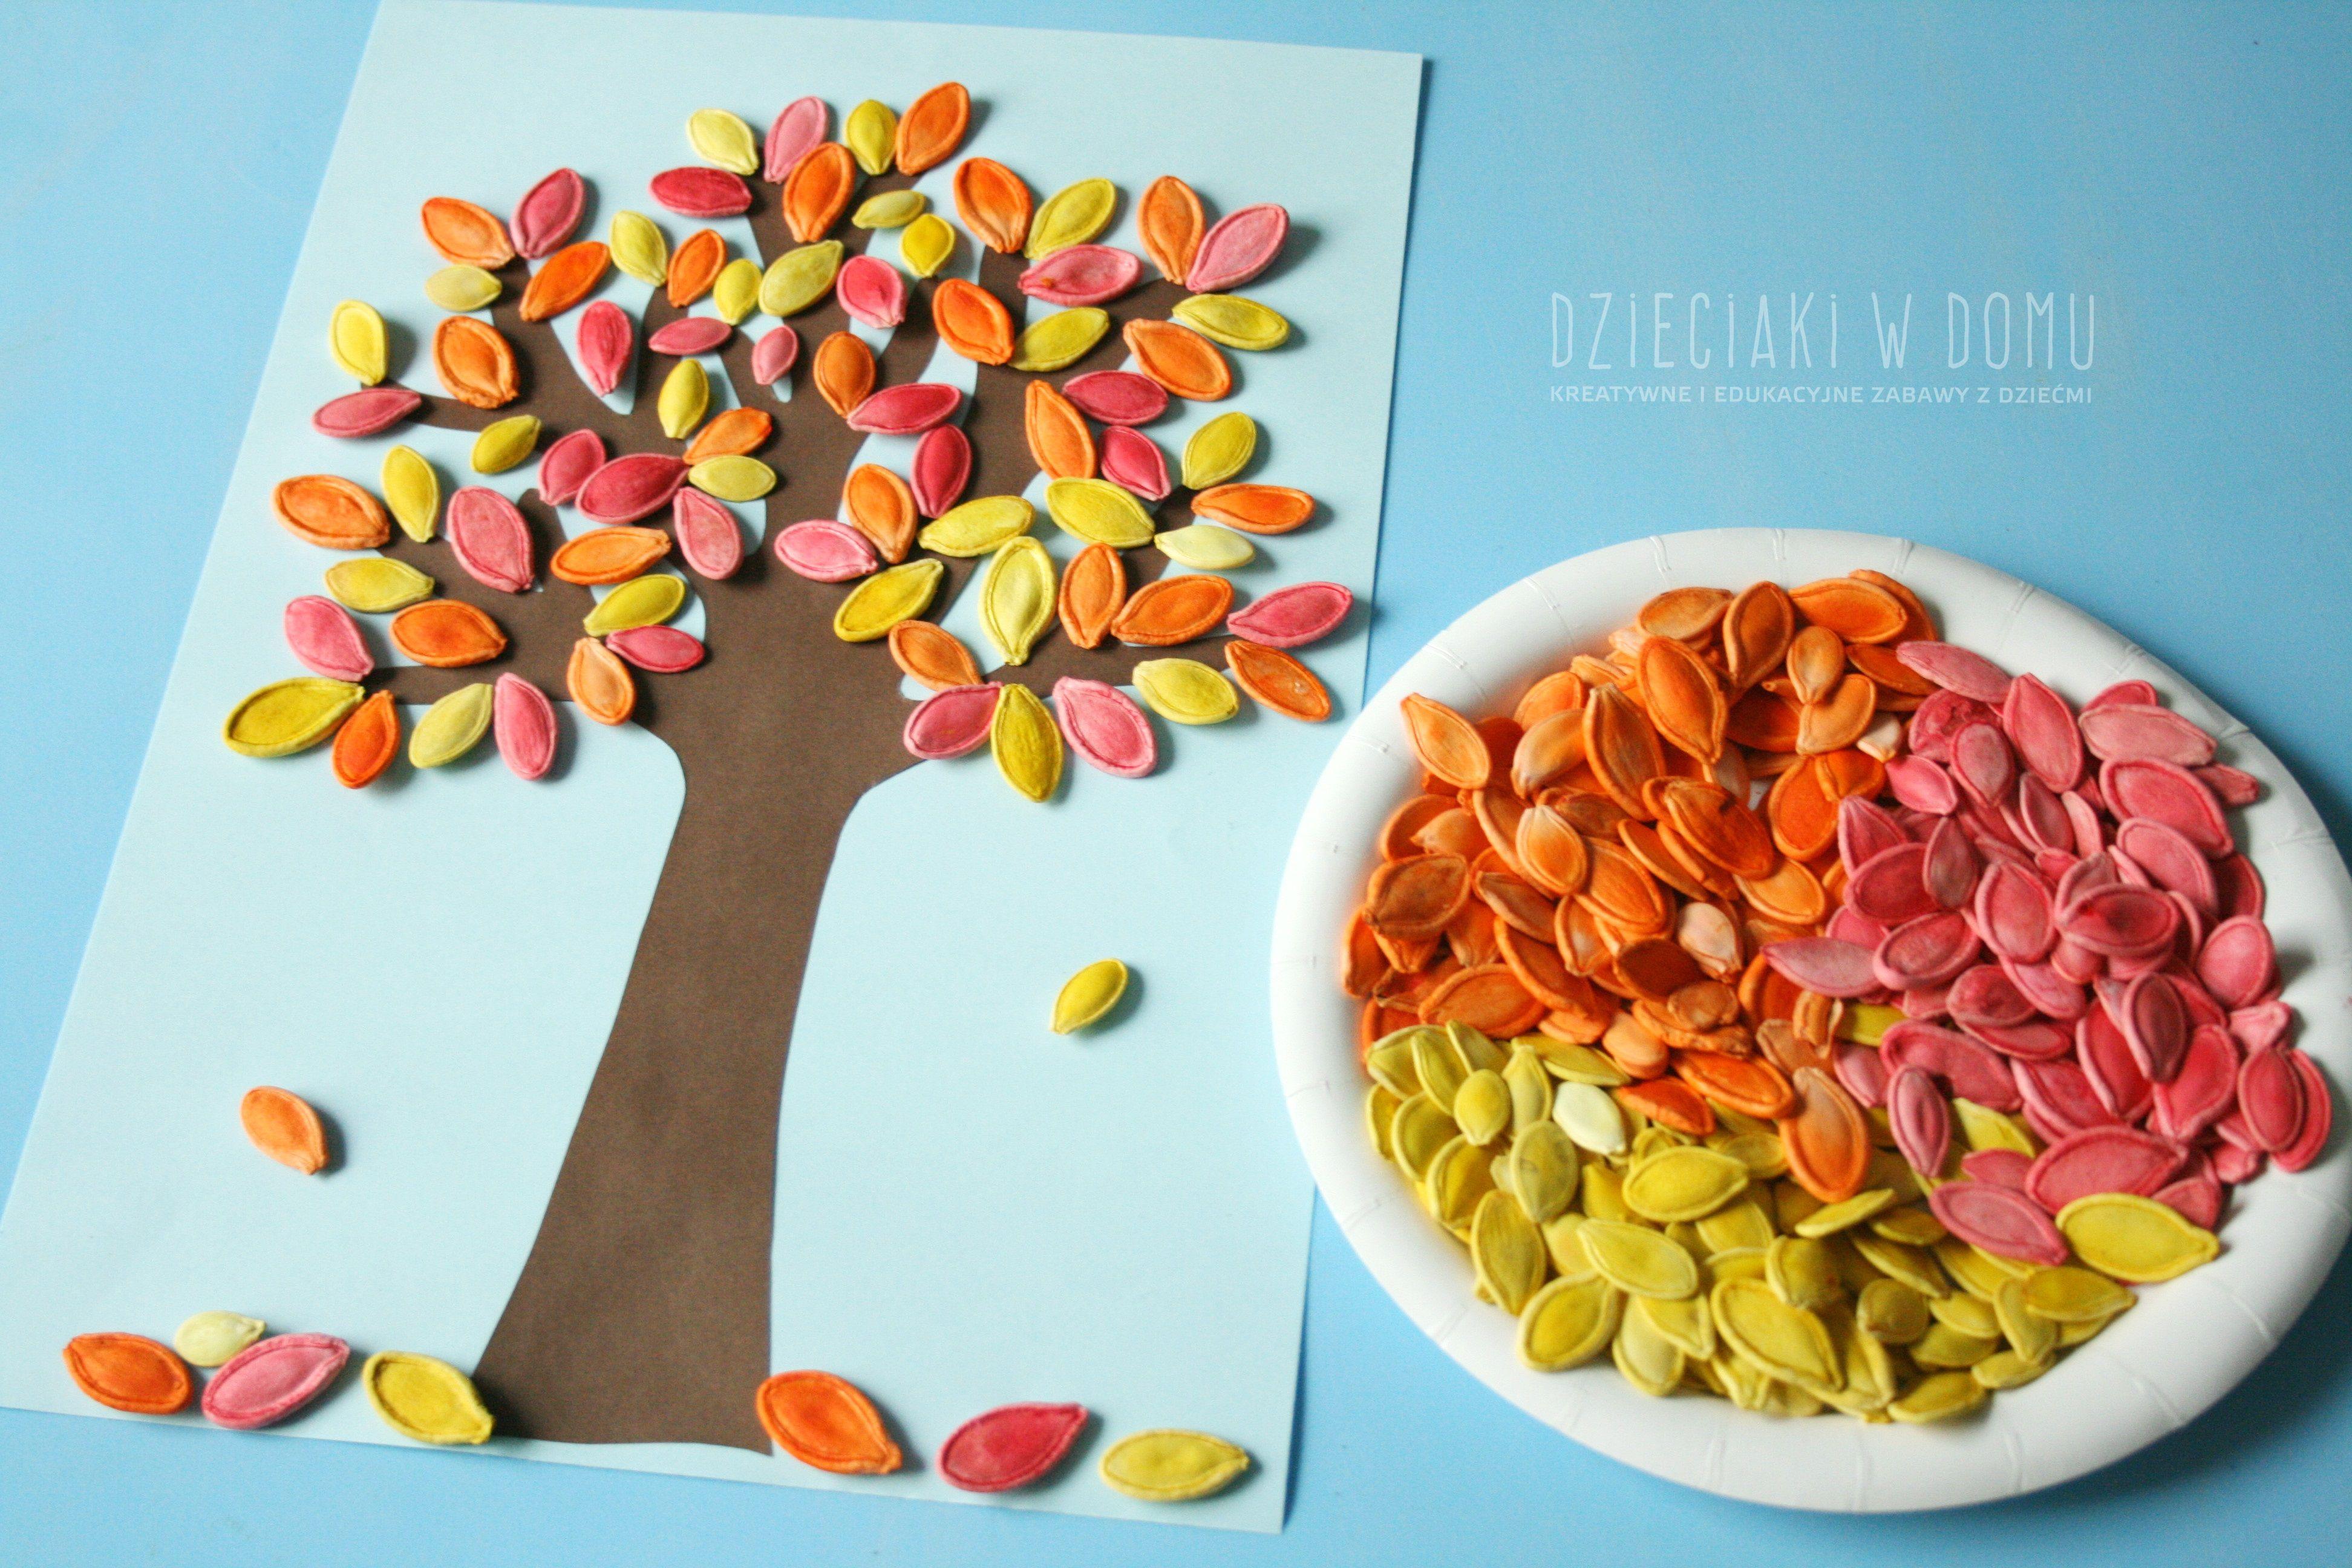 Jesienne Drzewko Z Pestek Dyni Dzieciaki W Domu Pumpkin Seed Crafts Thanksgiving Crafts For Kids Seed Crafts For Kids